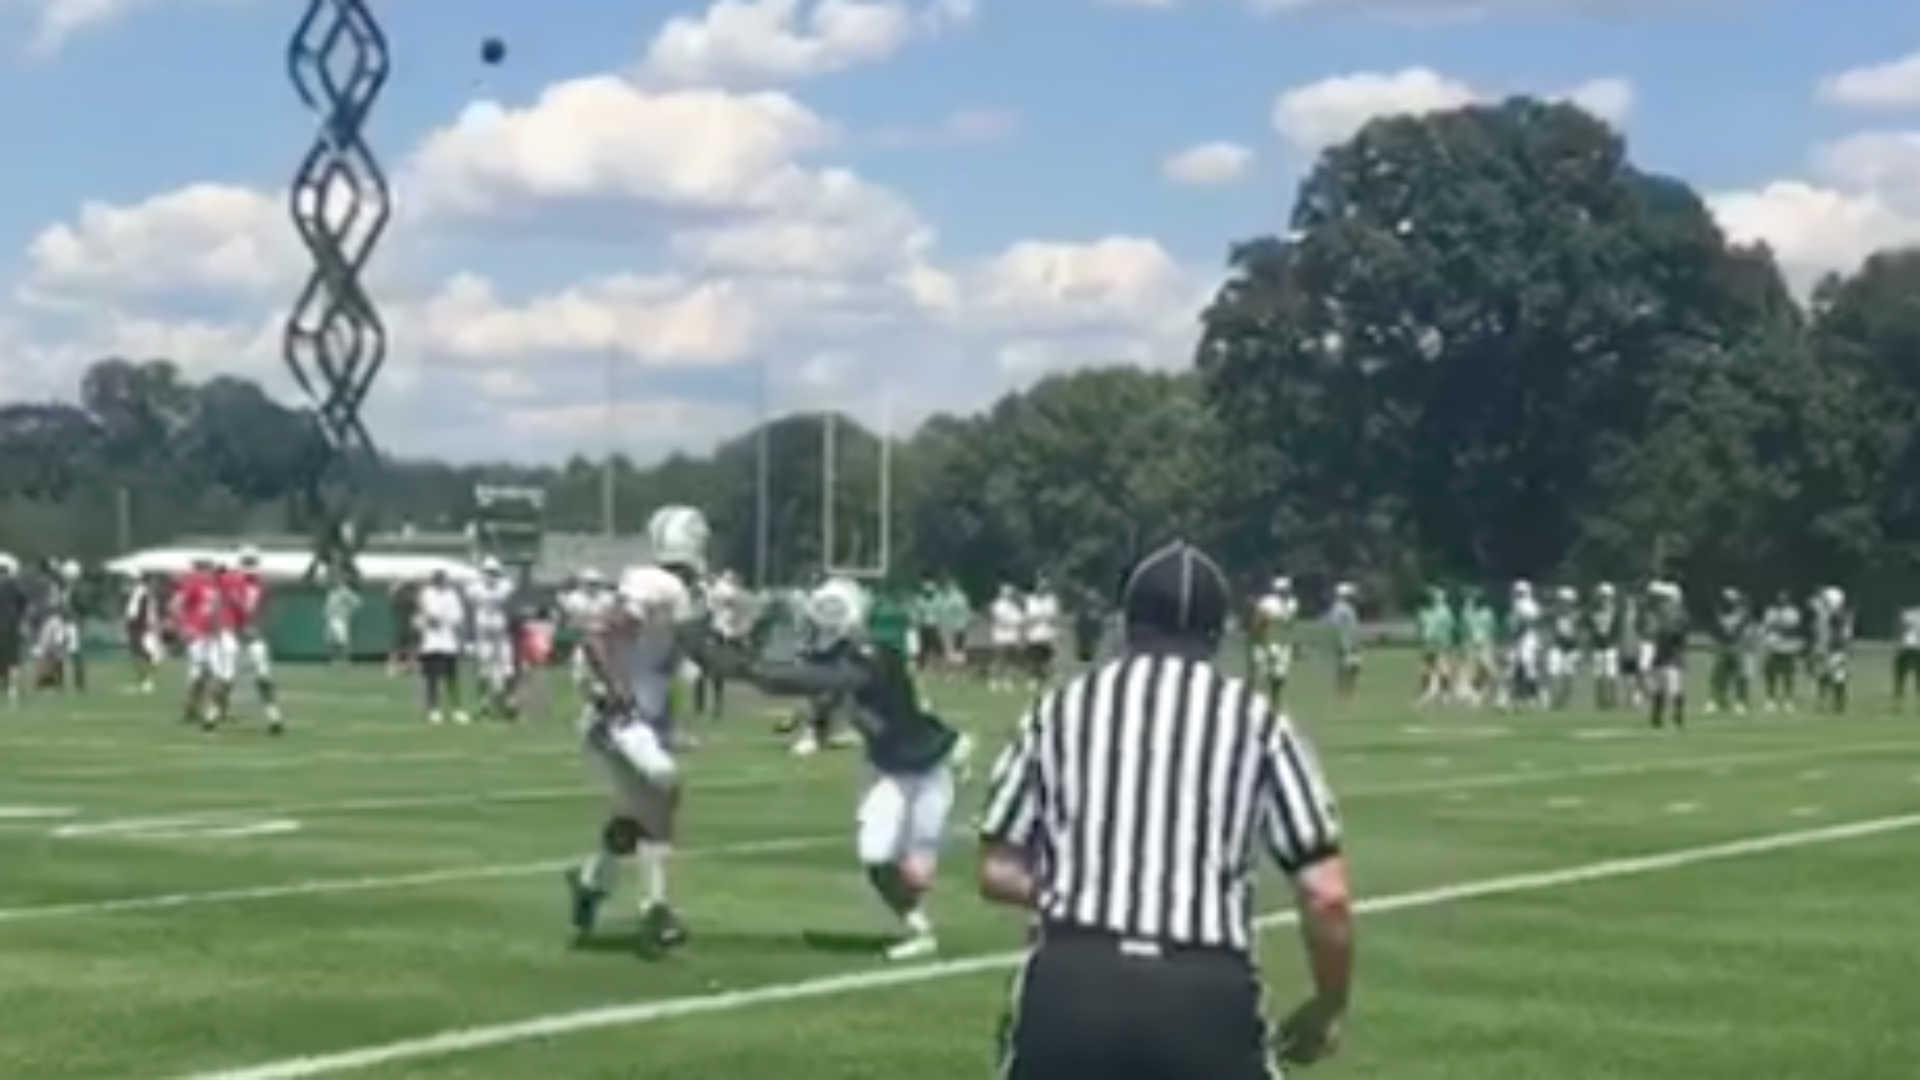 Brandon Marshall, Darrelle Revis put on show at Jets training camp